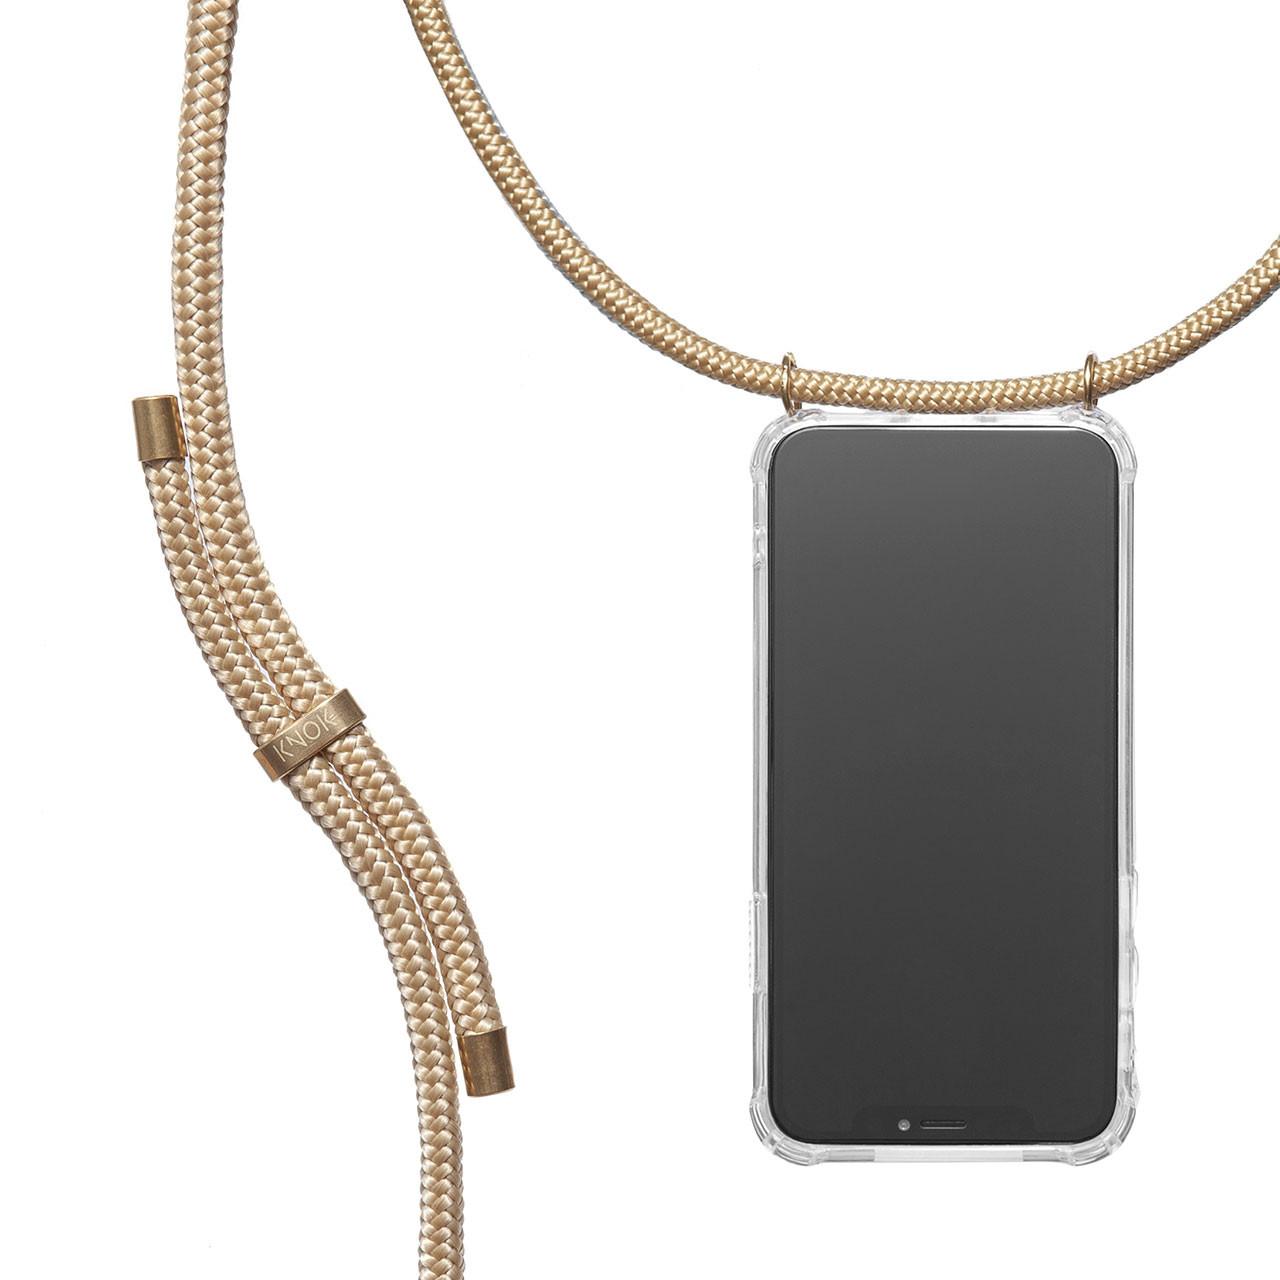 iPhone Case KNOK   Gold